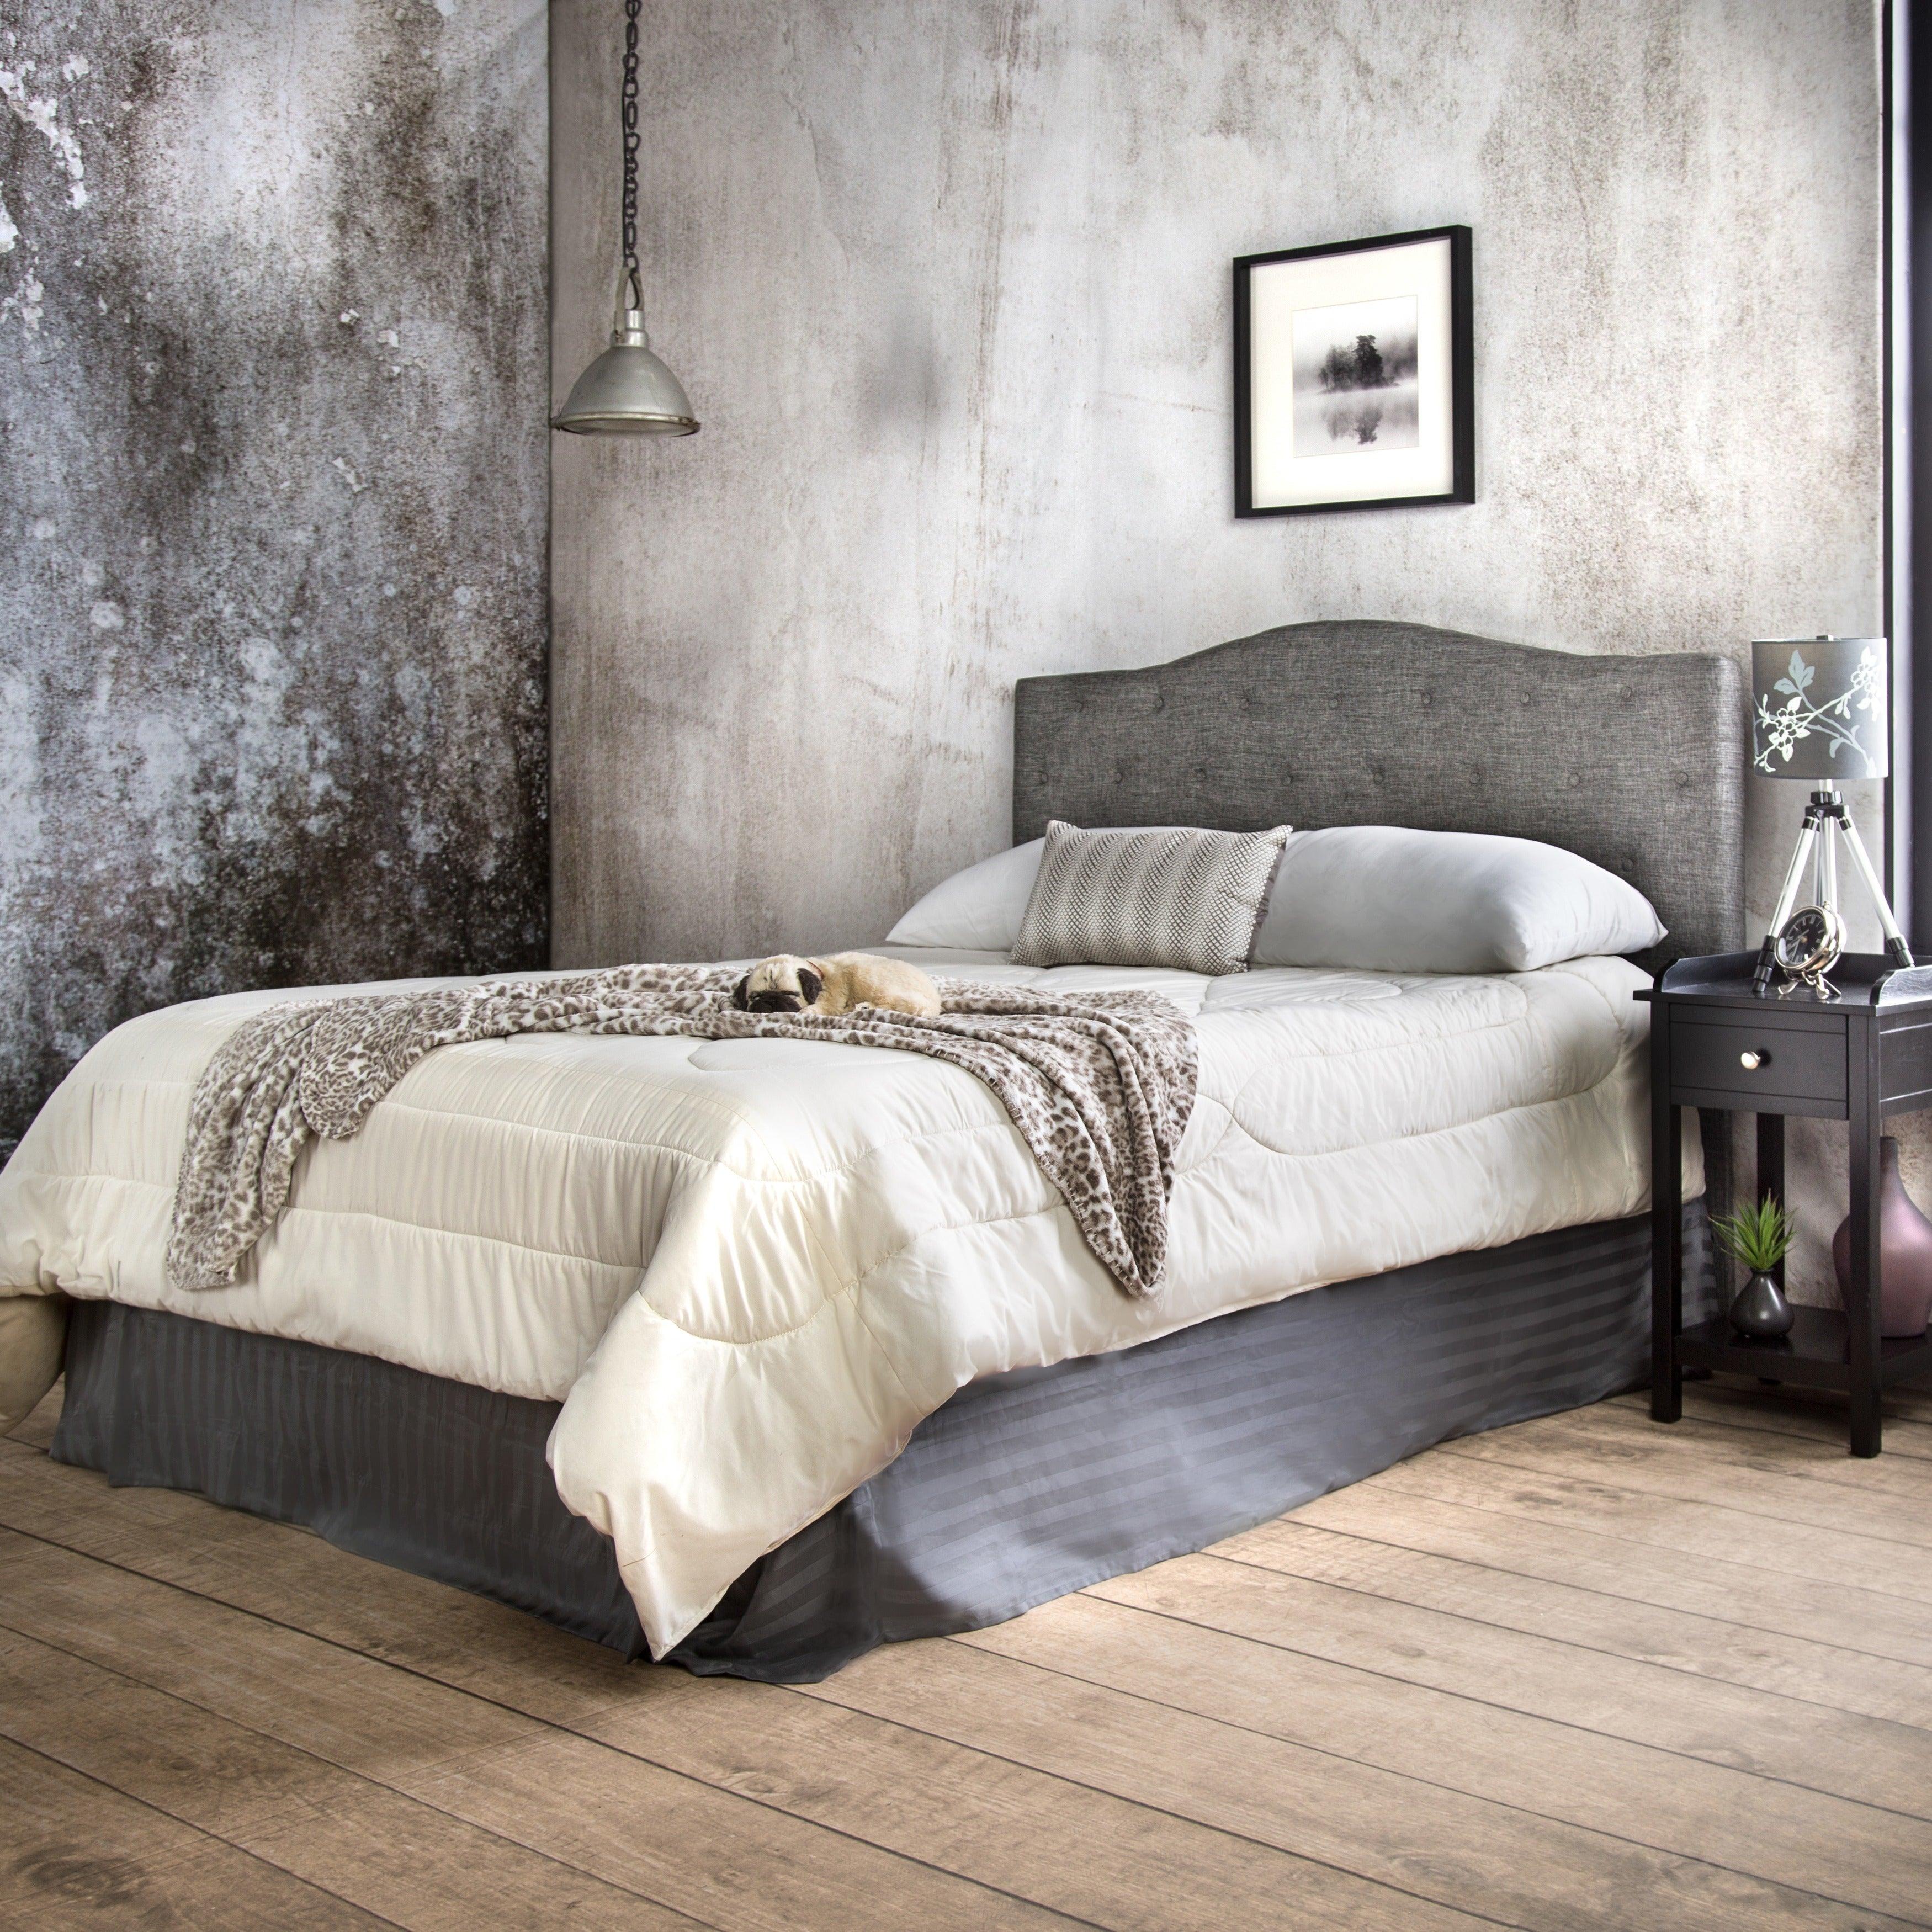 barn grey installation reclaimed diy product real from headboard made wood